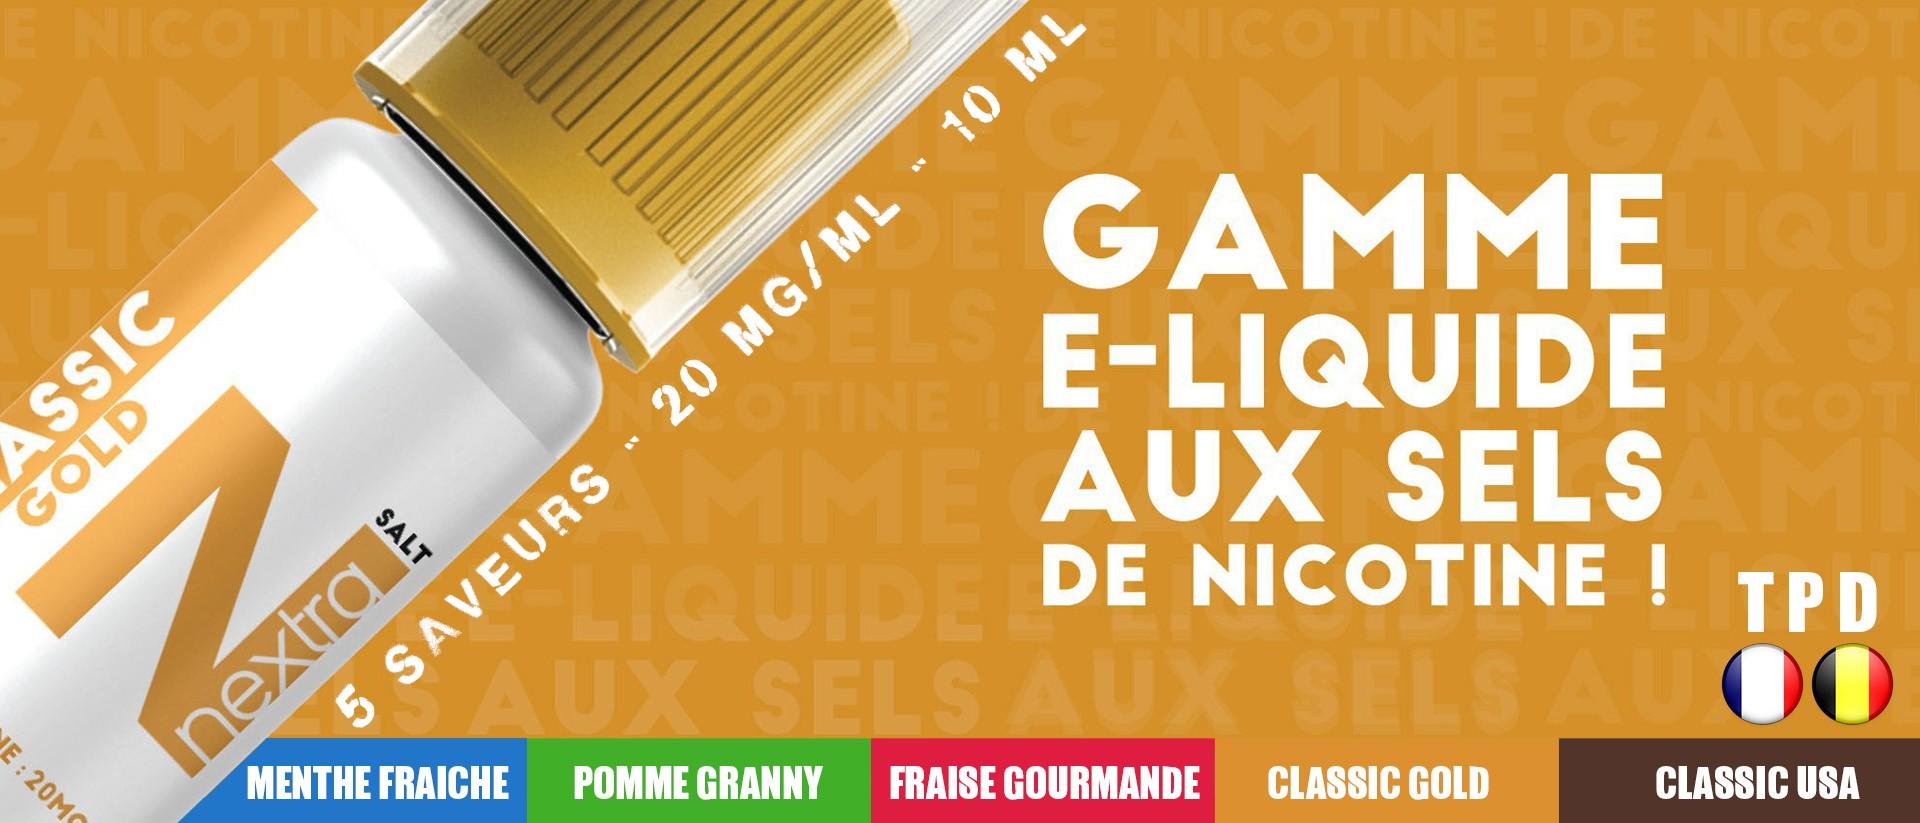 Nextra | E-liquides aux sels de nicotine